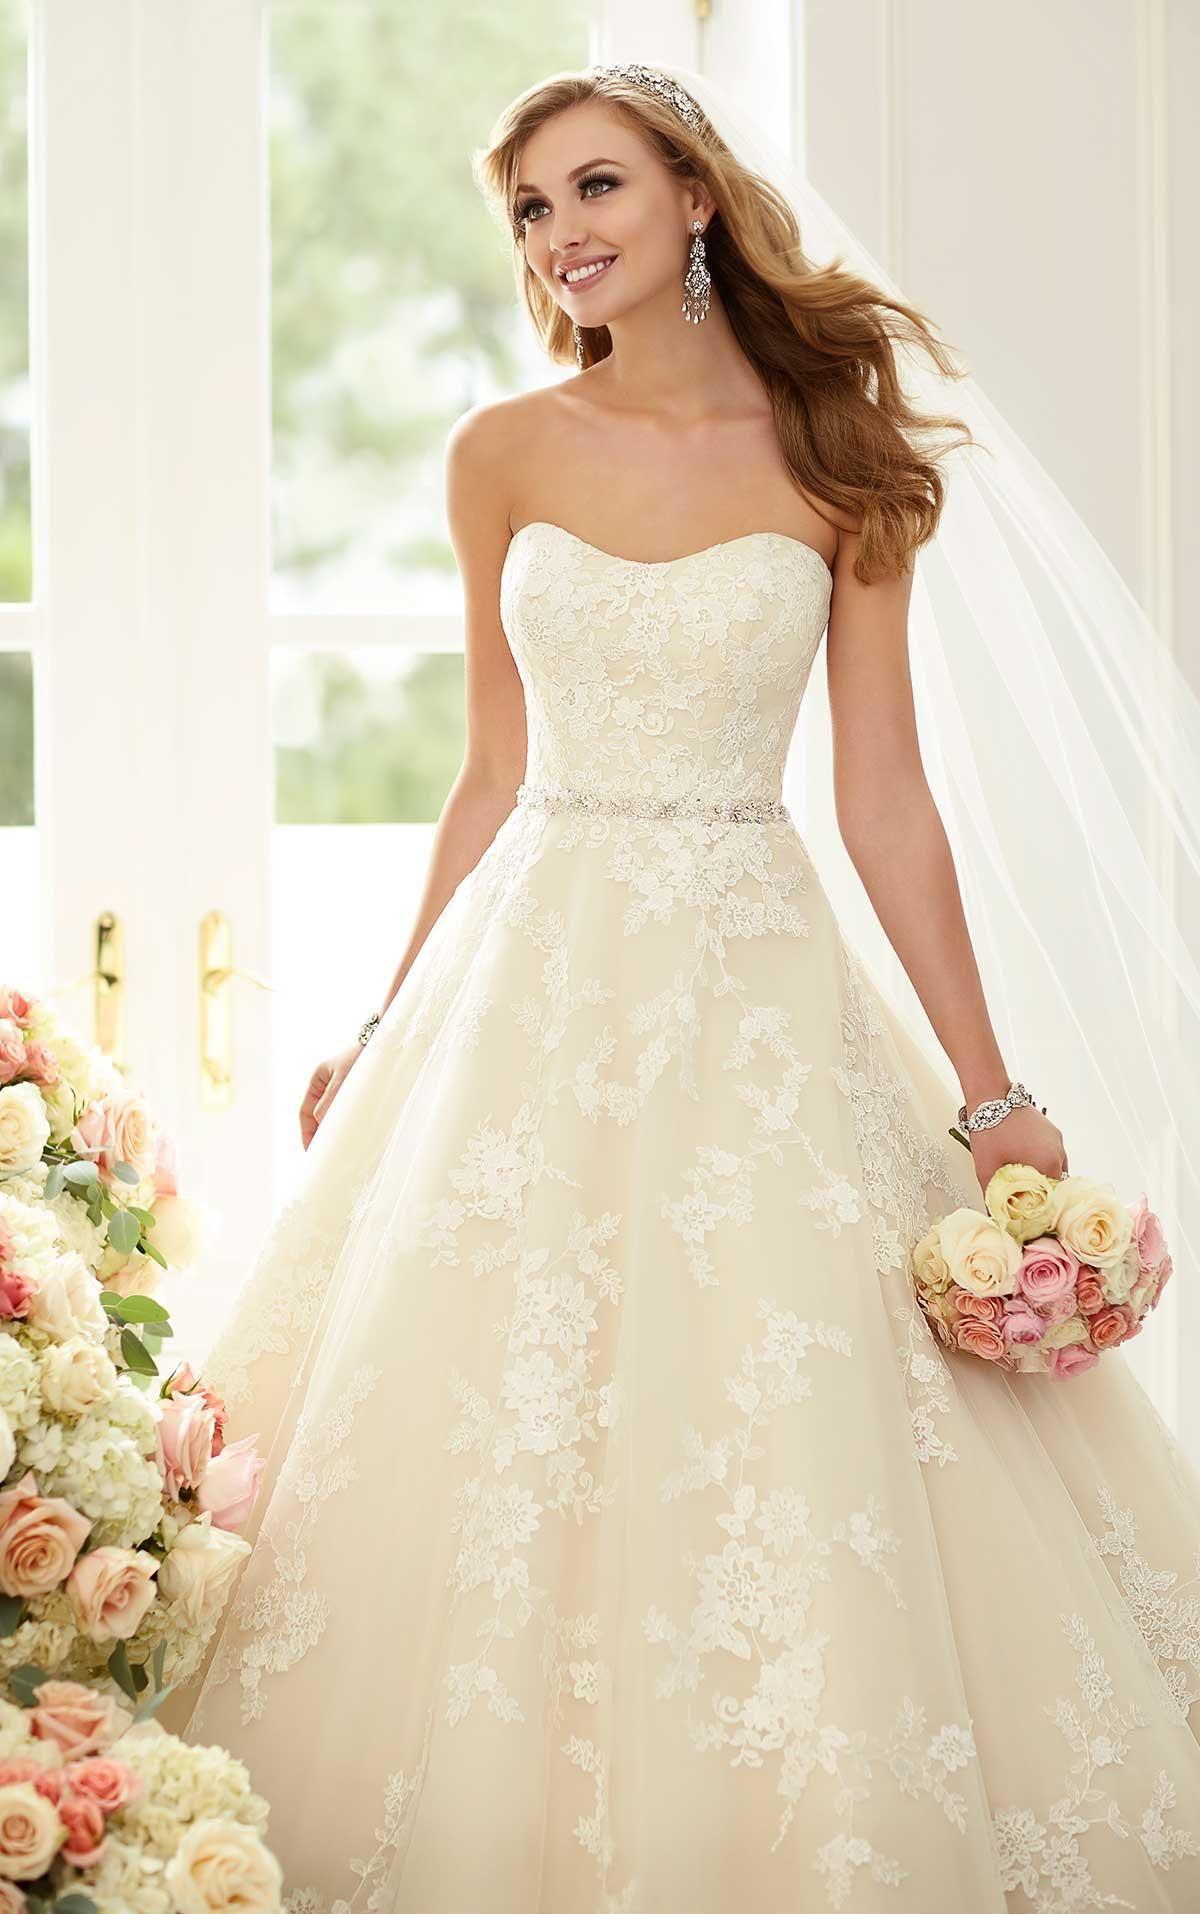 Long evening dresses ball gown wedding dresses free veil stella